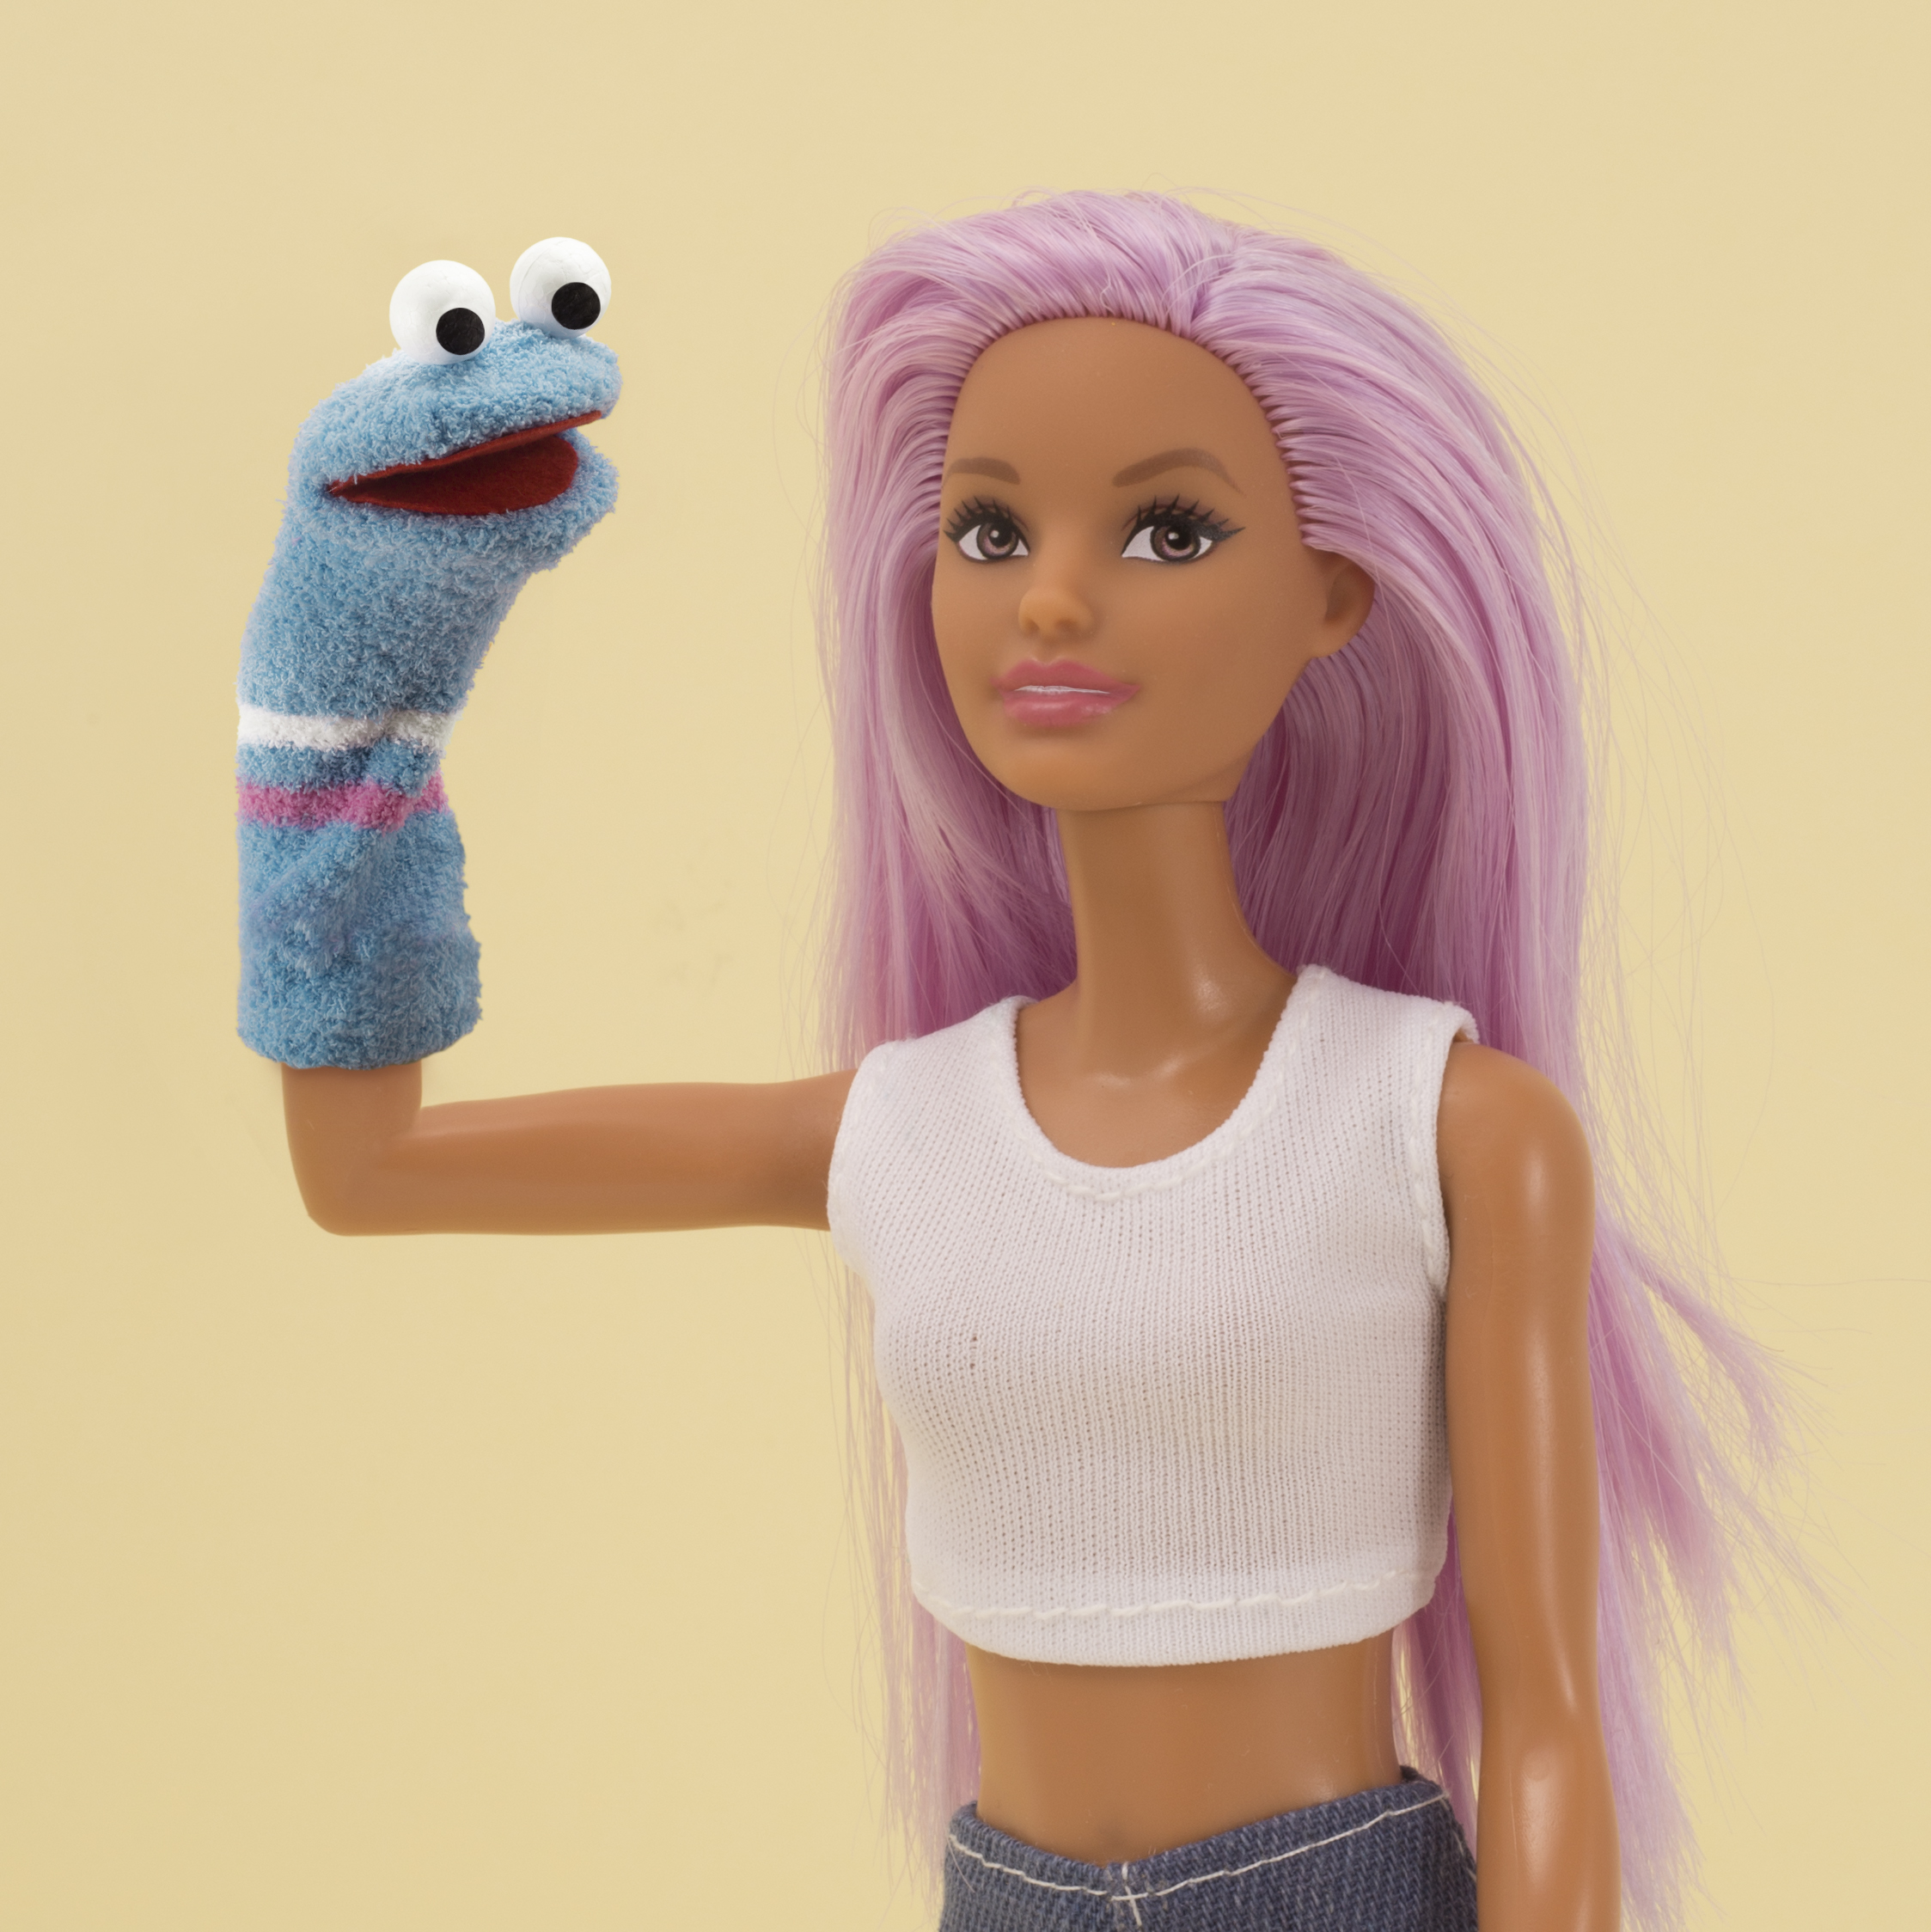 muppet_C.jpg